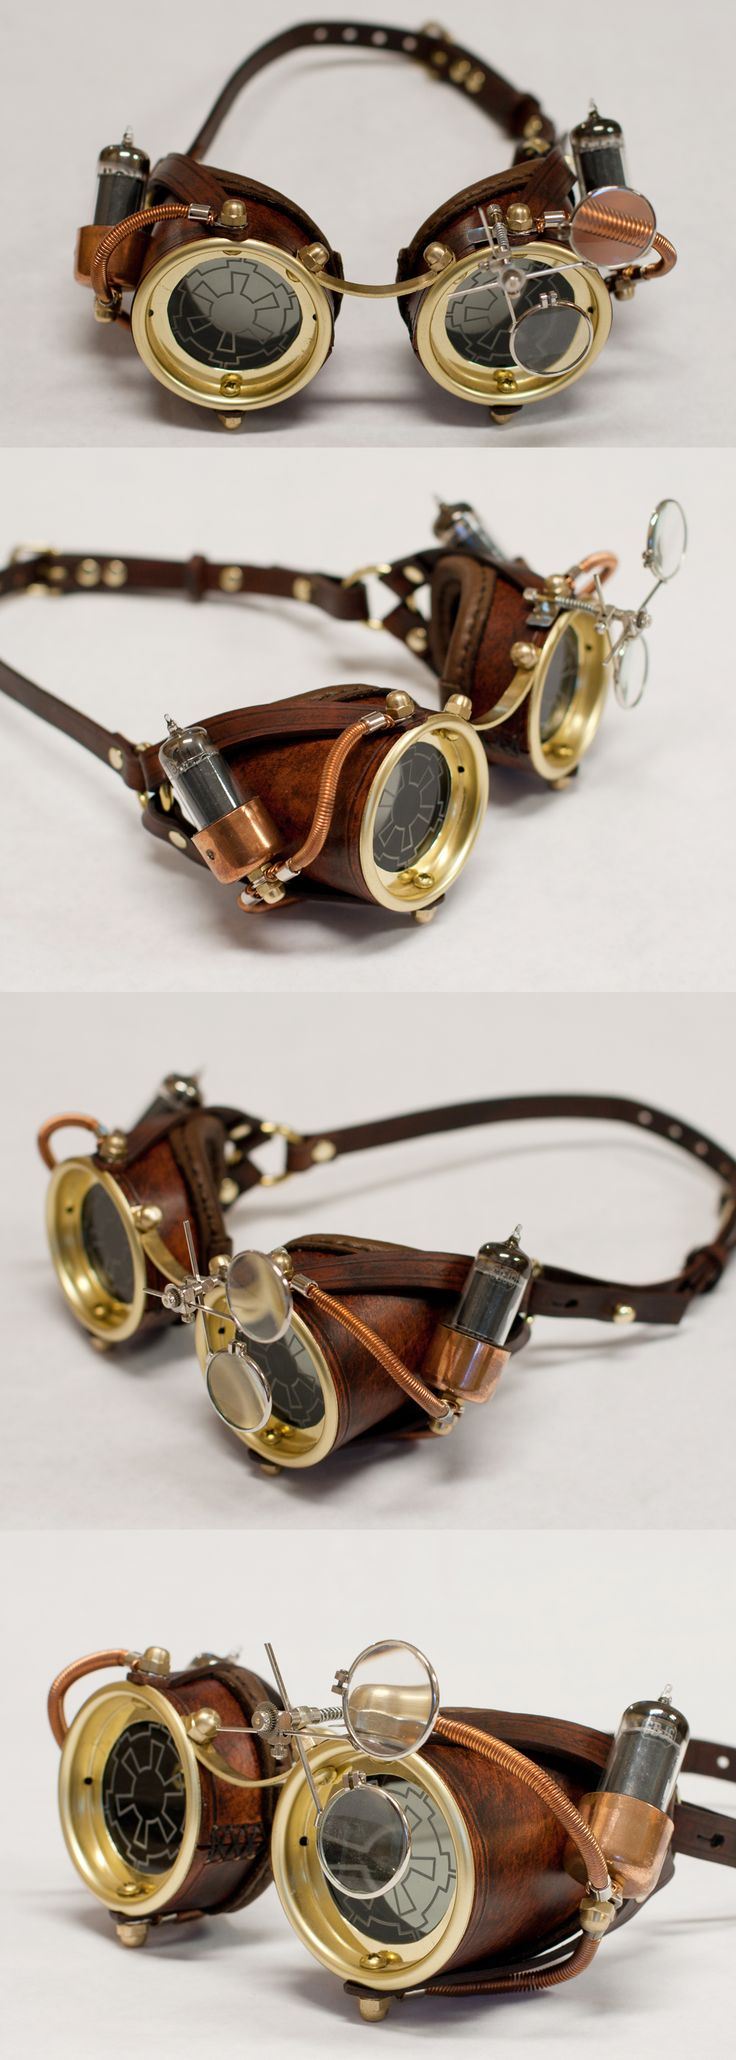 Ocular Enhancers - Steampunk Goggles by asdemeladen.deviantart.com on @deviantART - Monde Du Loisir - www.mondeduloisir.fr